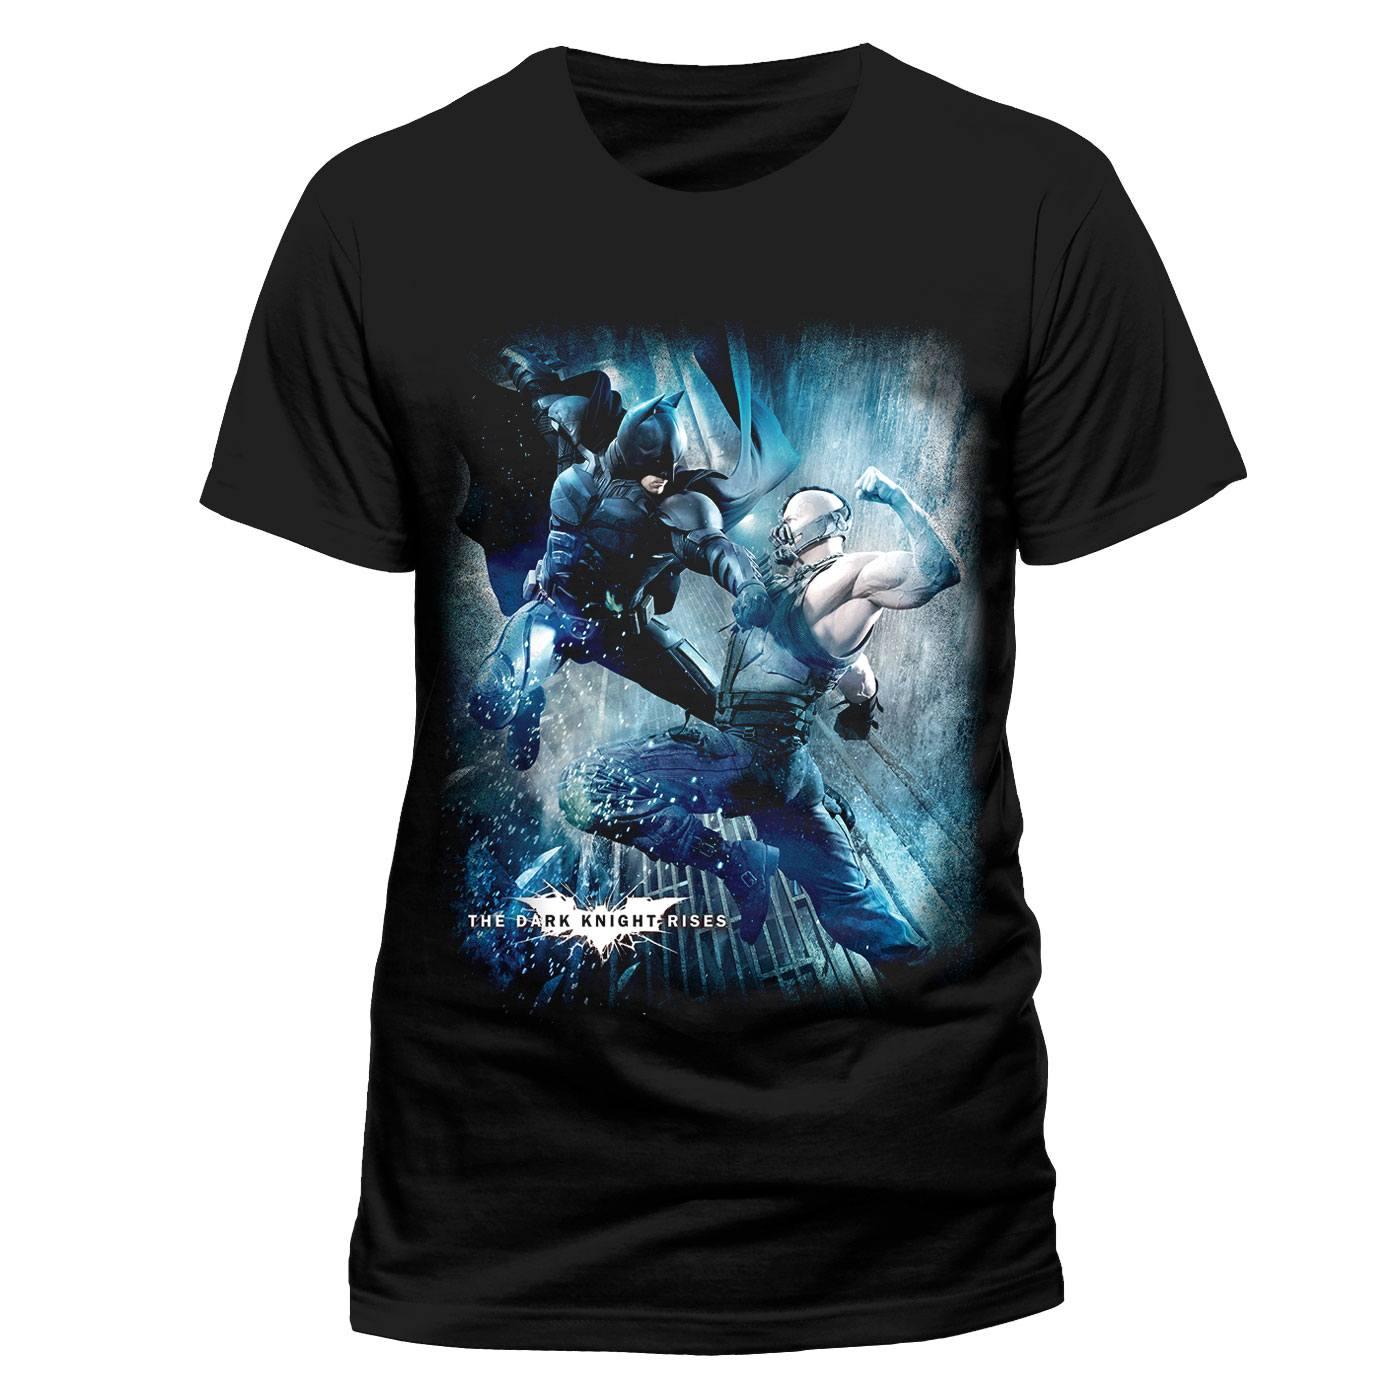 Batman The Dark Knight T-Shirt Bane VS Batman Size XL